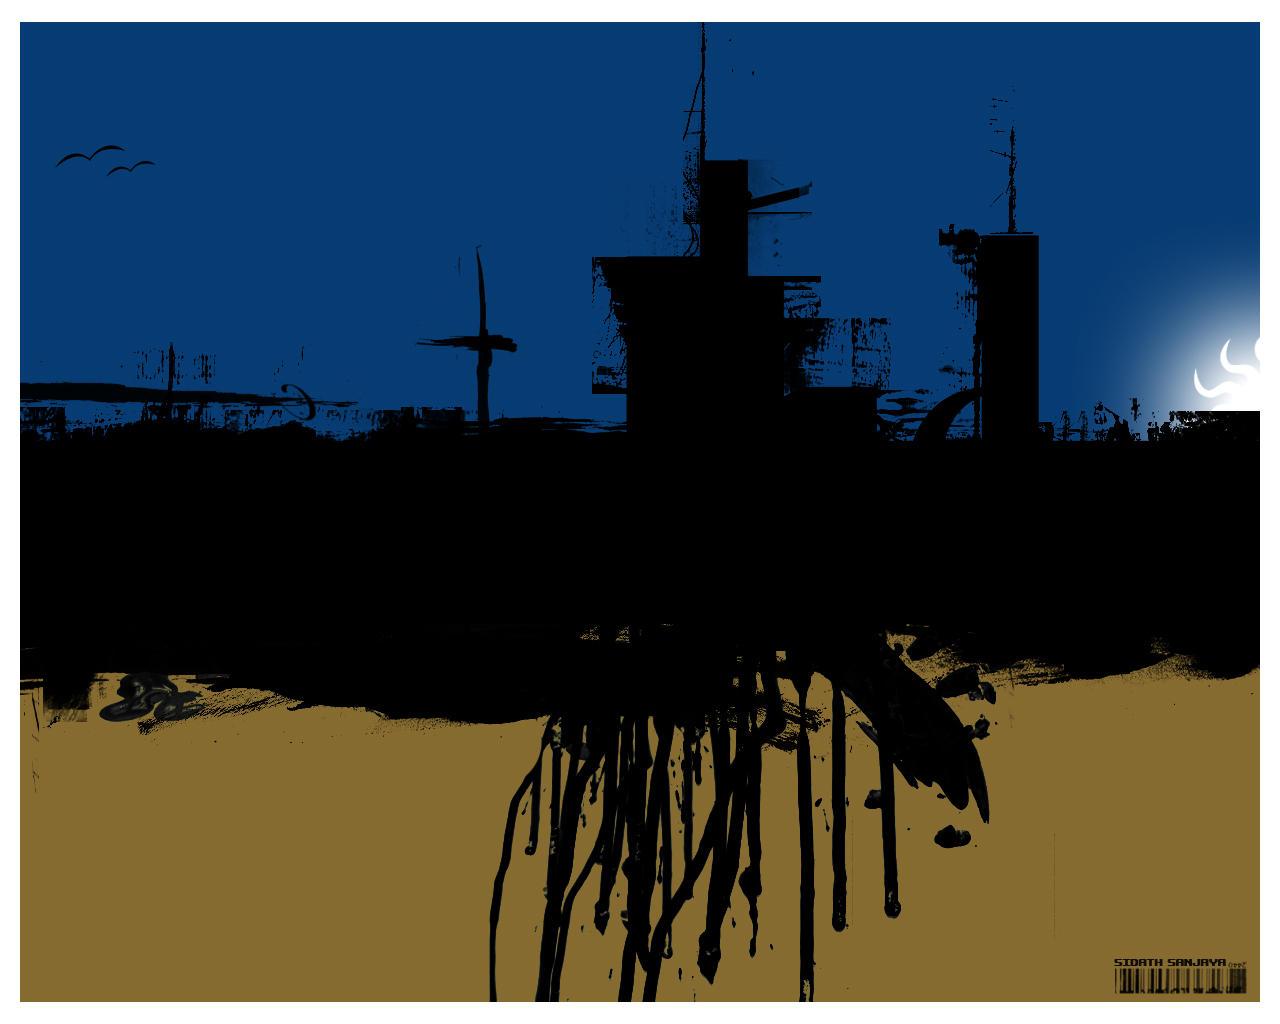 dark city by sidath